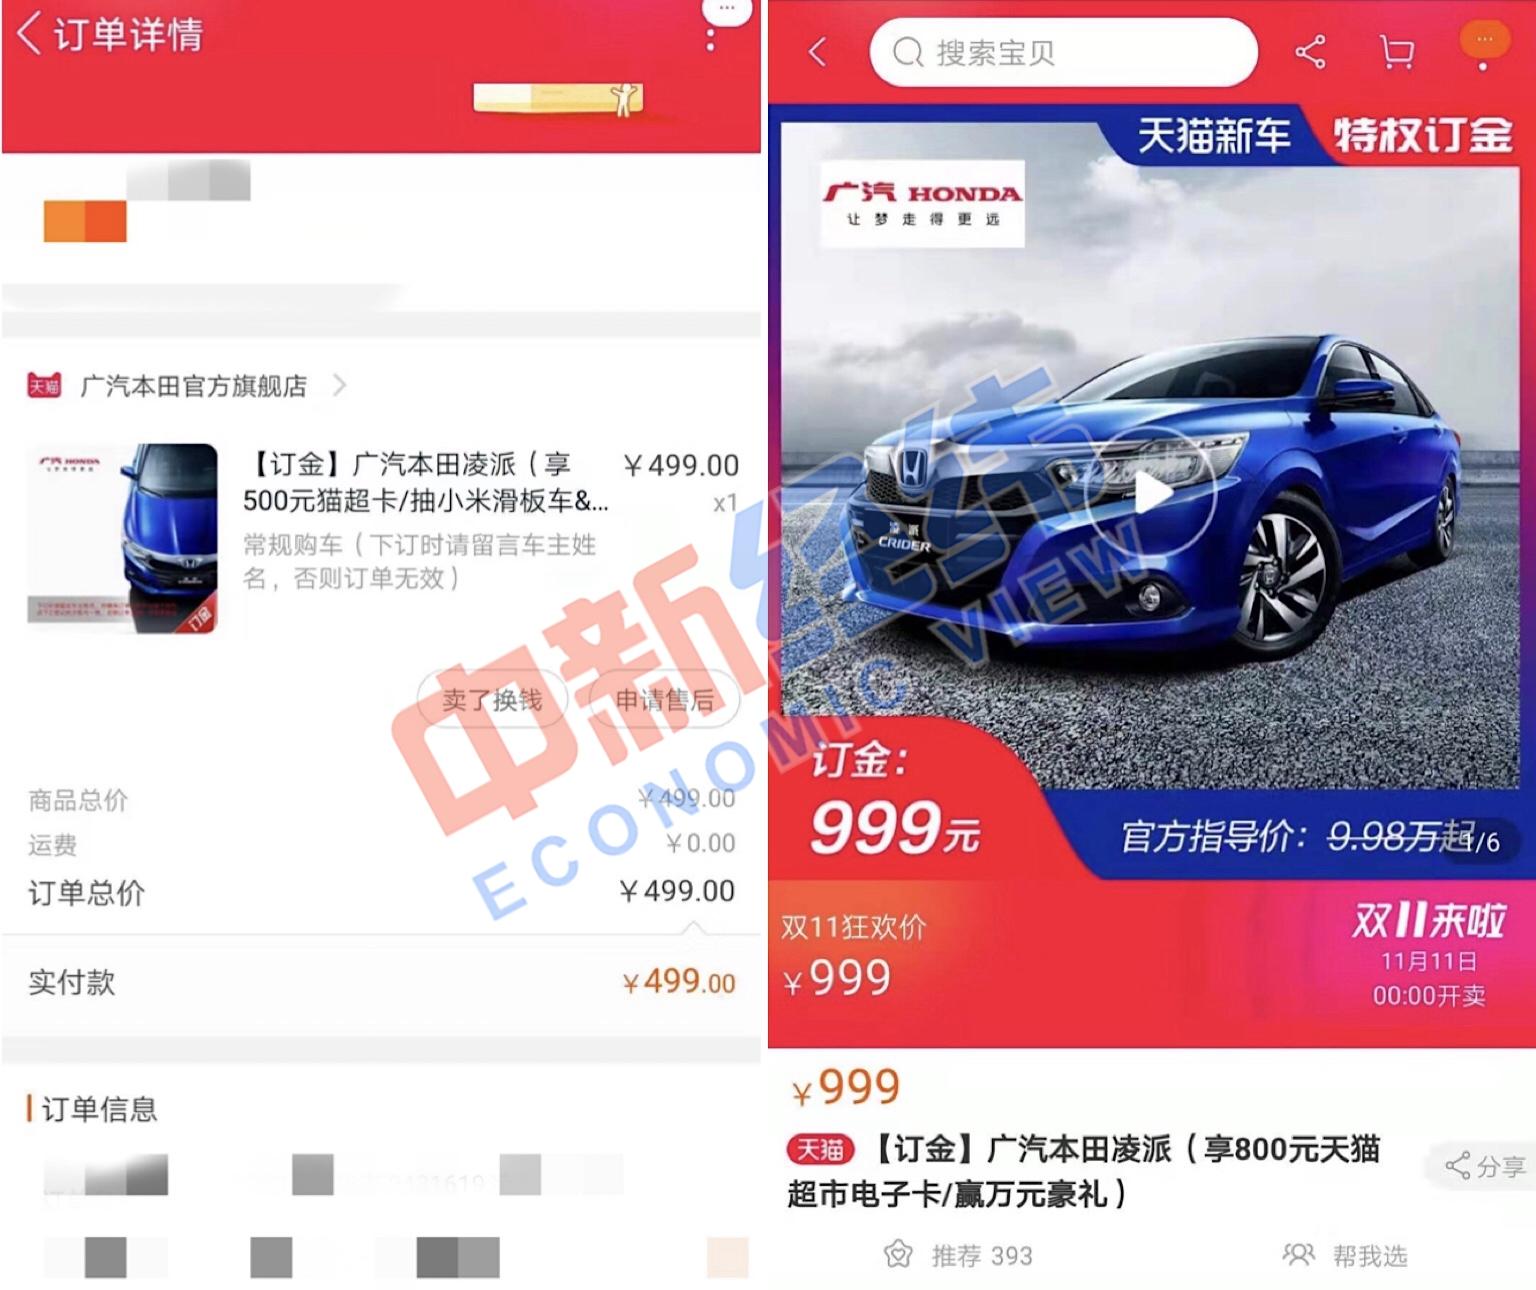 lovebet诈骗6亿 - 私募创业家之神农投资陈宇:从净值取胜到管理决胜